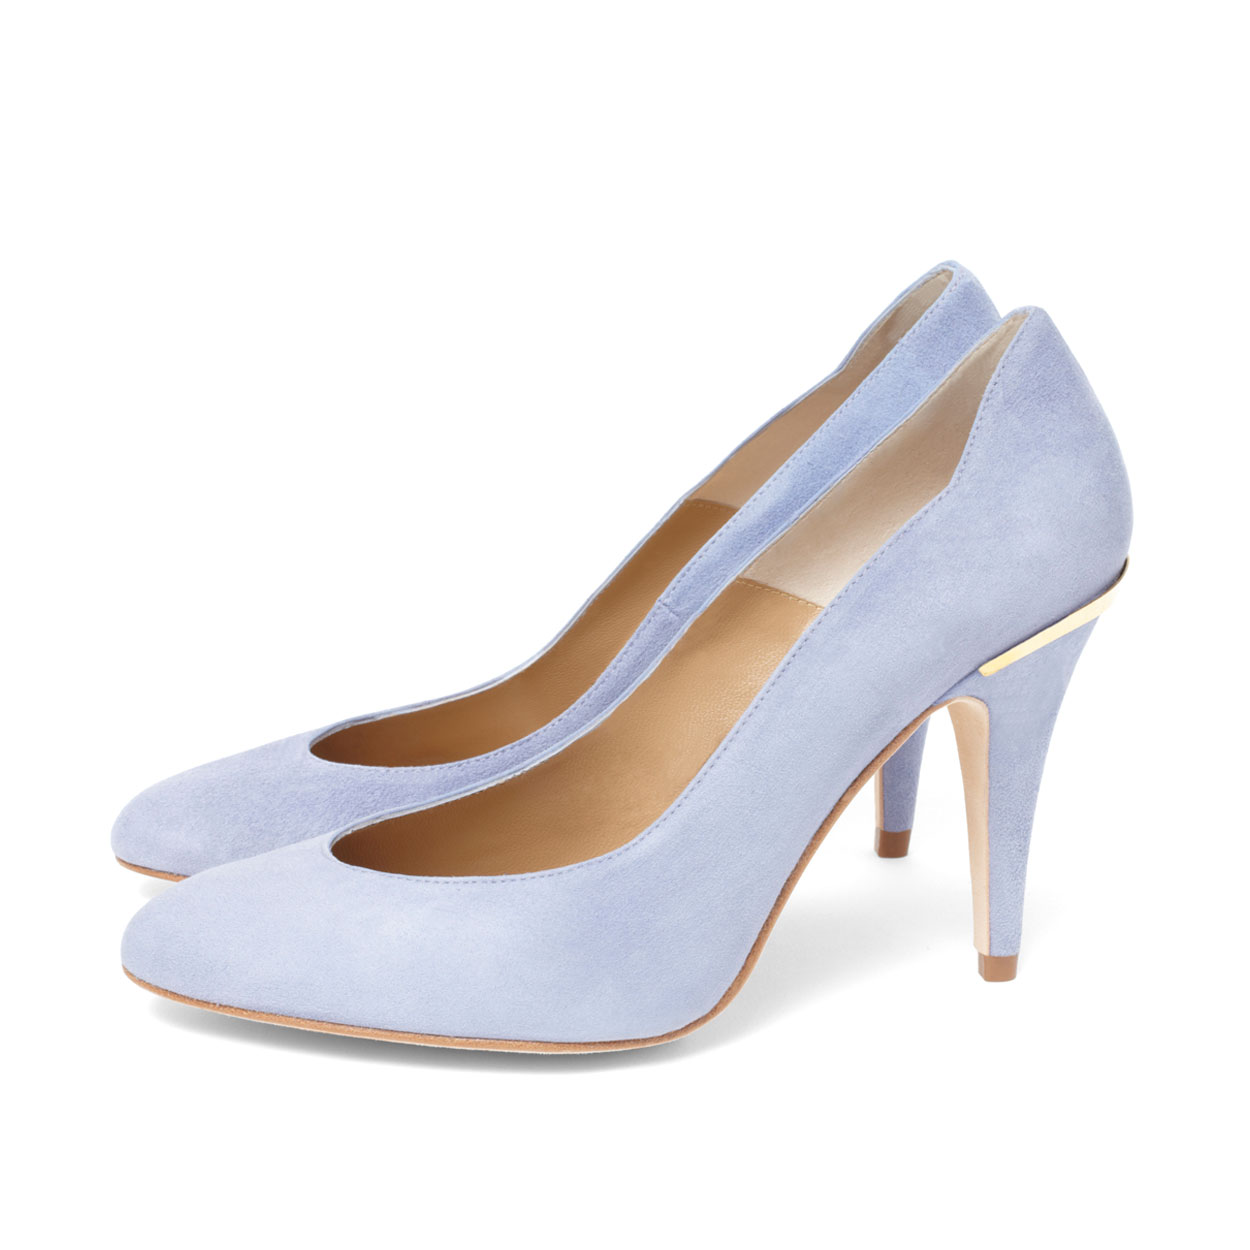 jazz-blue-pair-pastel-colour-cleob-heels-shopping-luxury.jpg